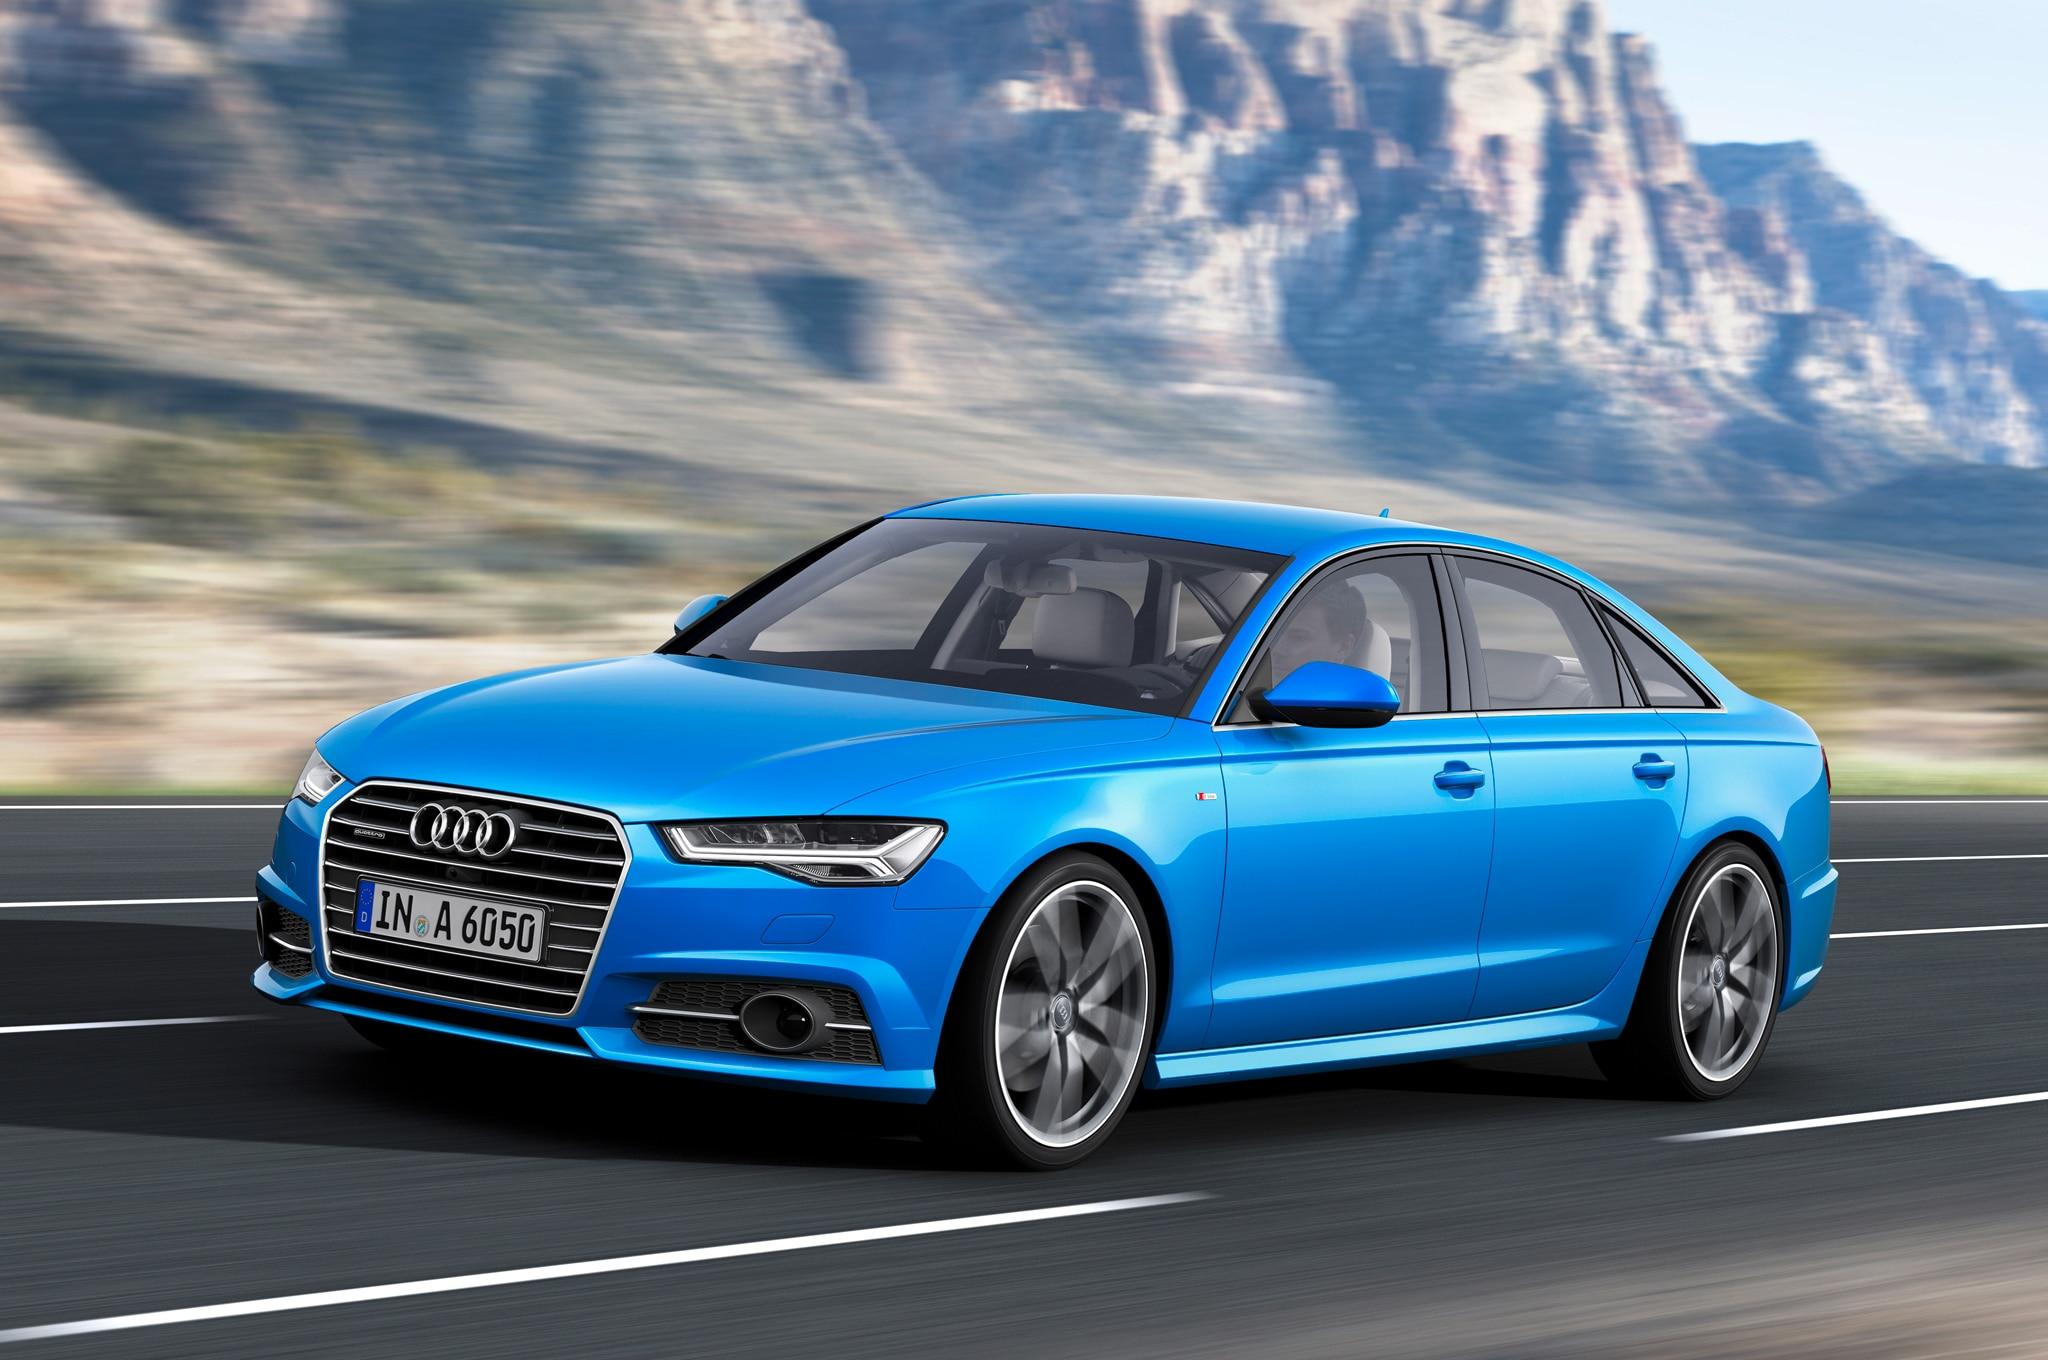 2016 Audi A6 European Spec Front Three Quarter In Motion1